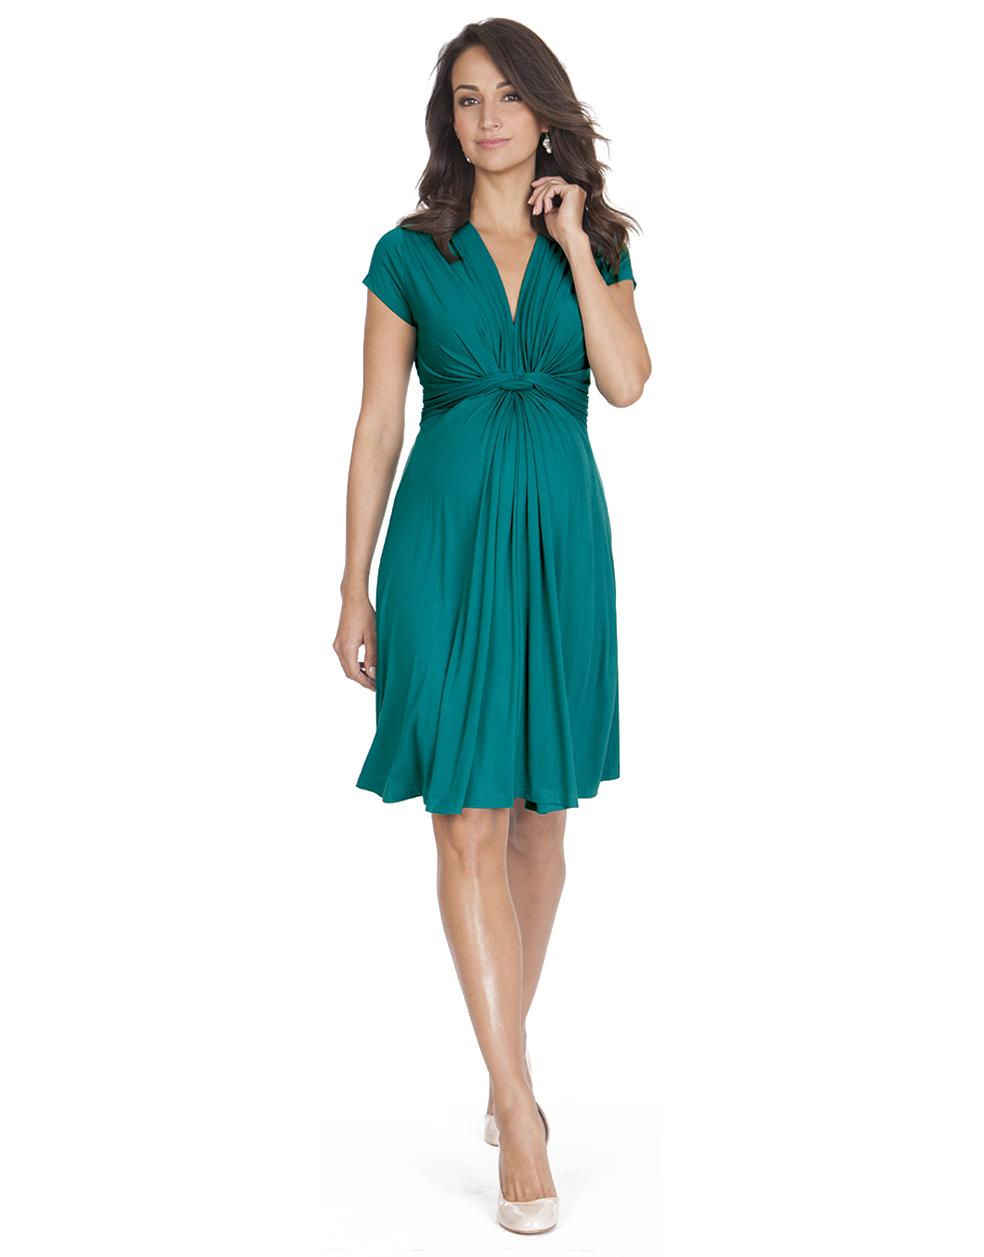 1fb4b2cefe1b3 Jolene Peacock Green Knot Maternity Dress in 2019 | Maternity ...